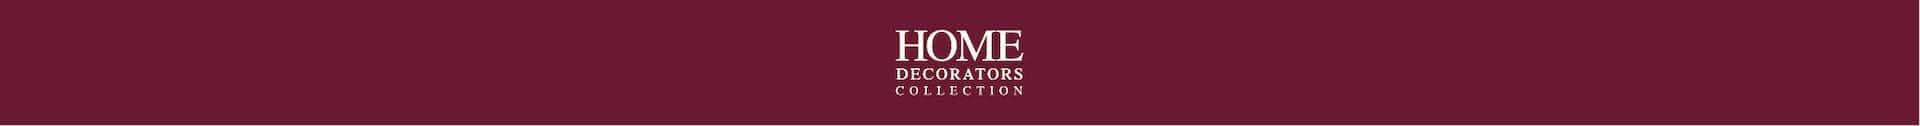 Home Decorators Collection flooring